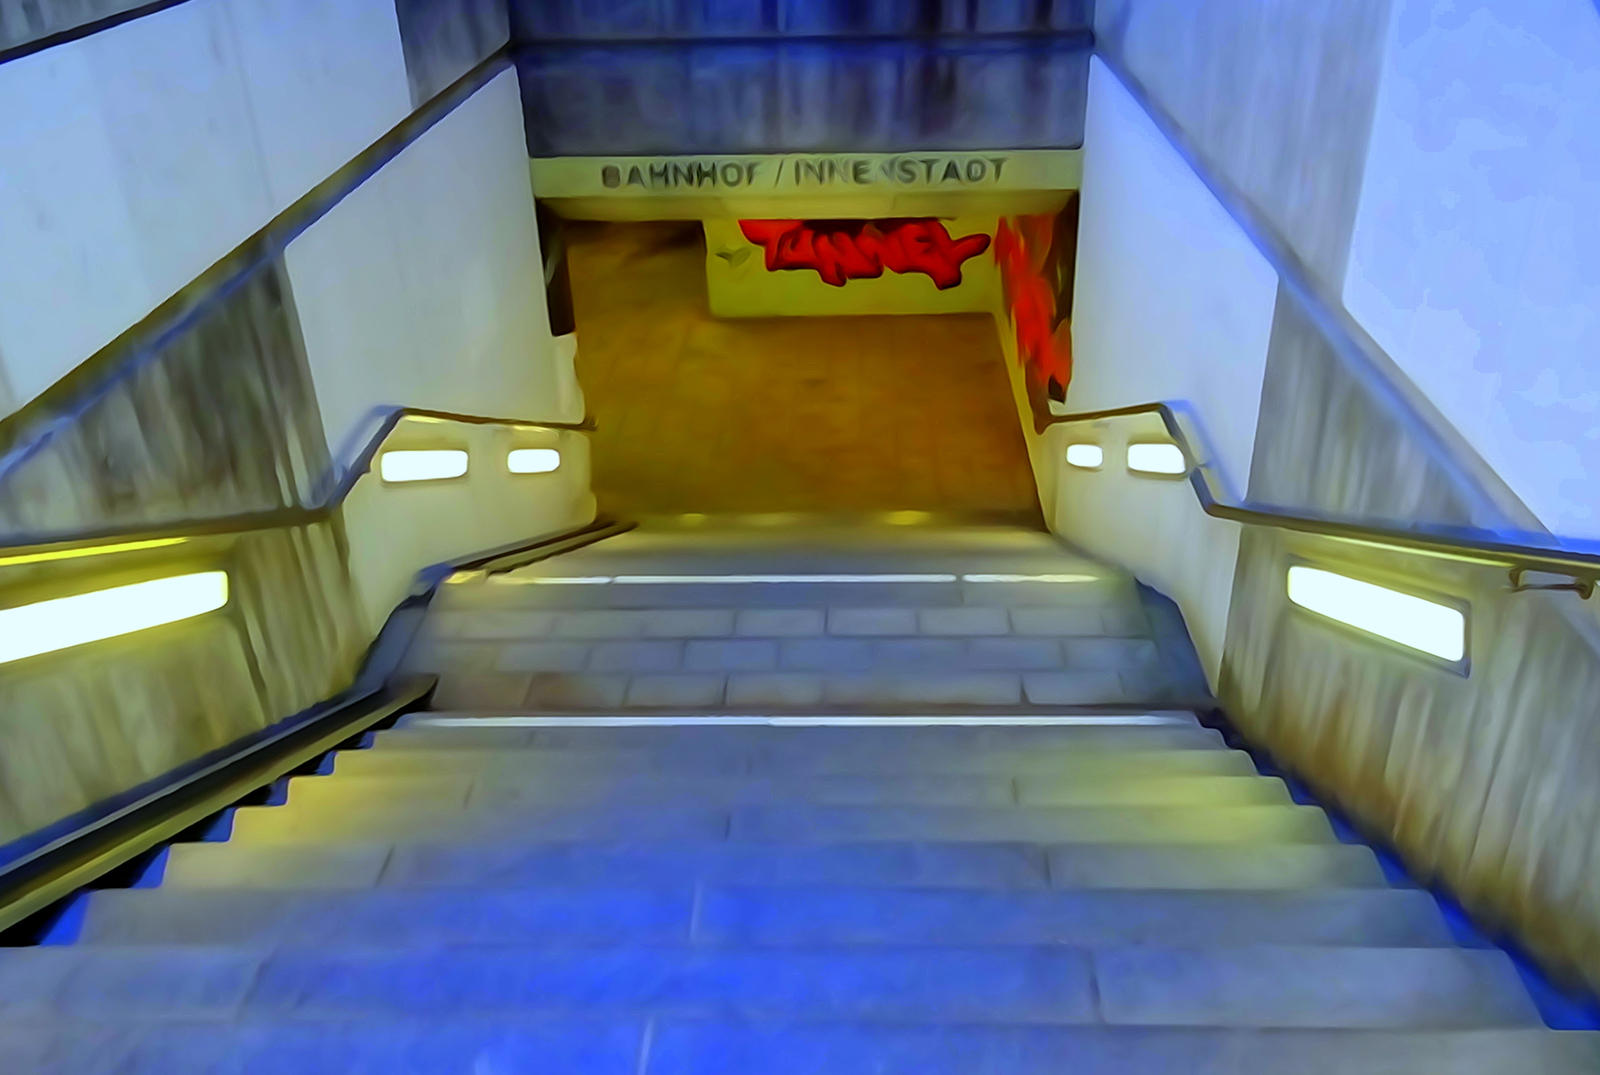 downstairs by Mittelfranke